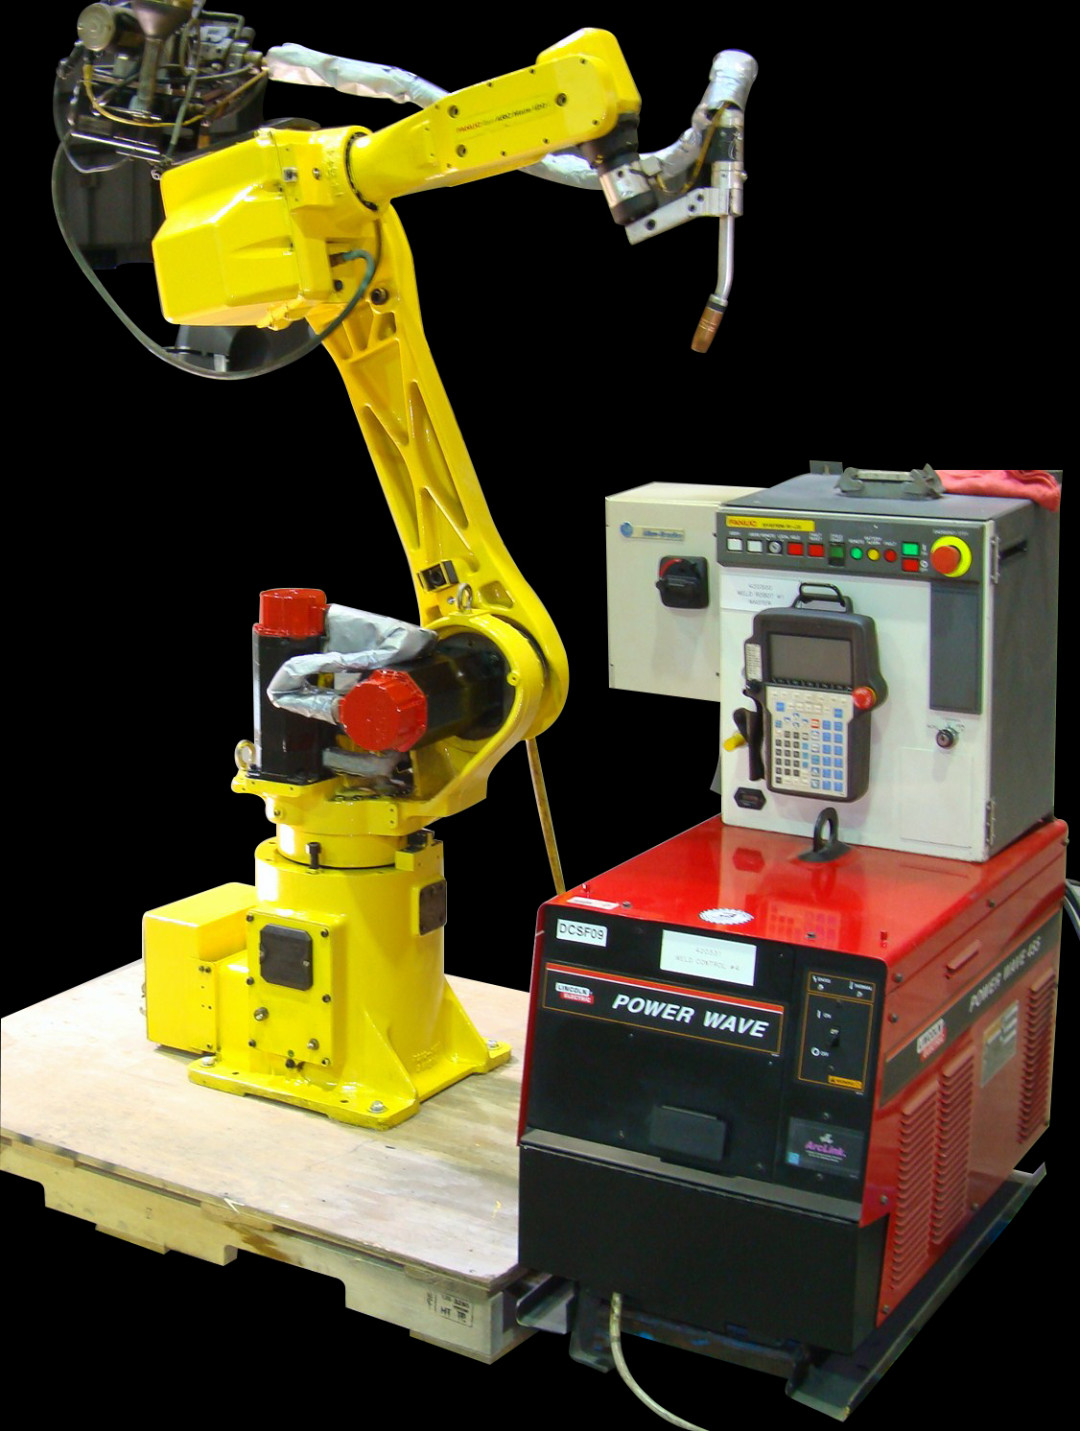 Fanuc Robot Pendant manual